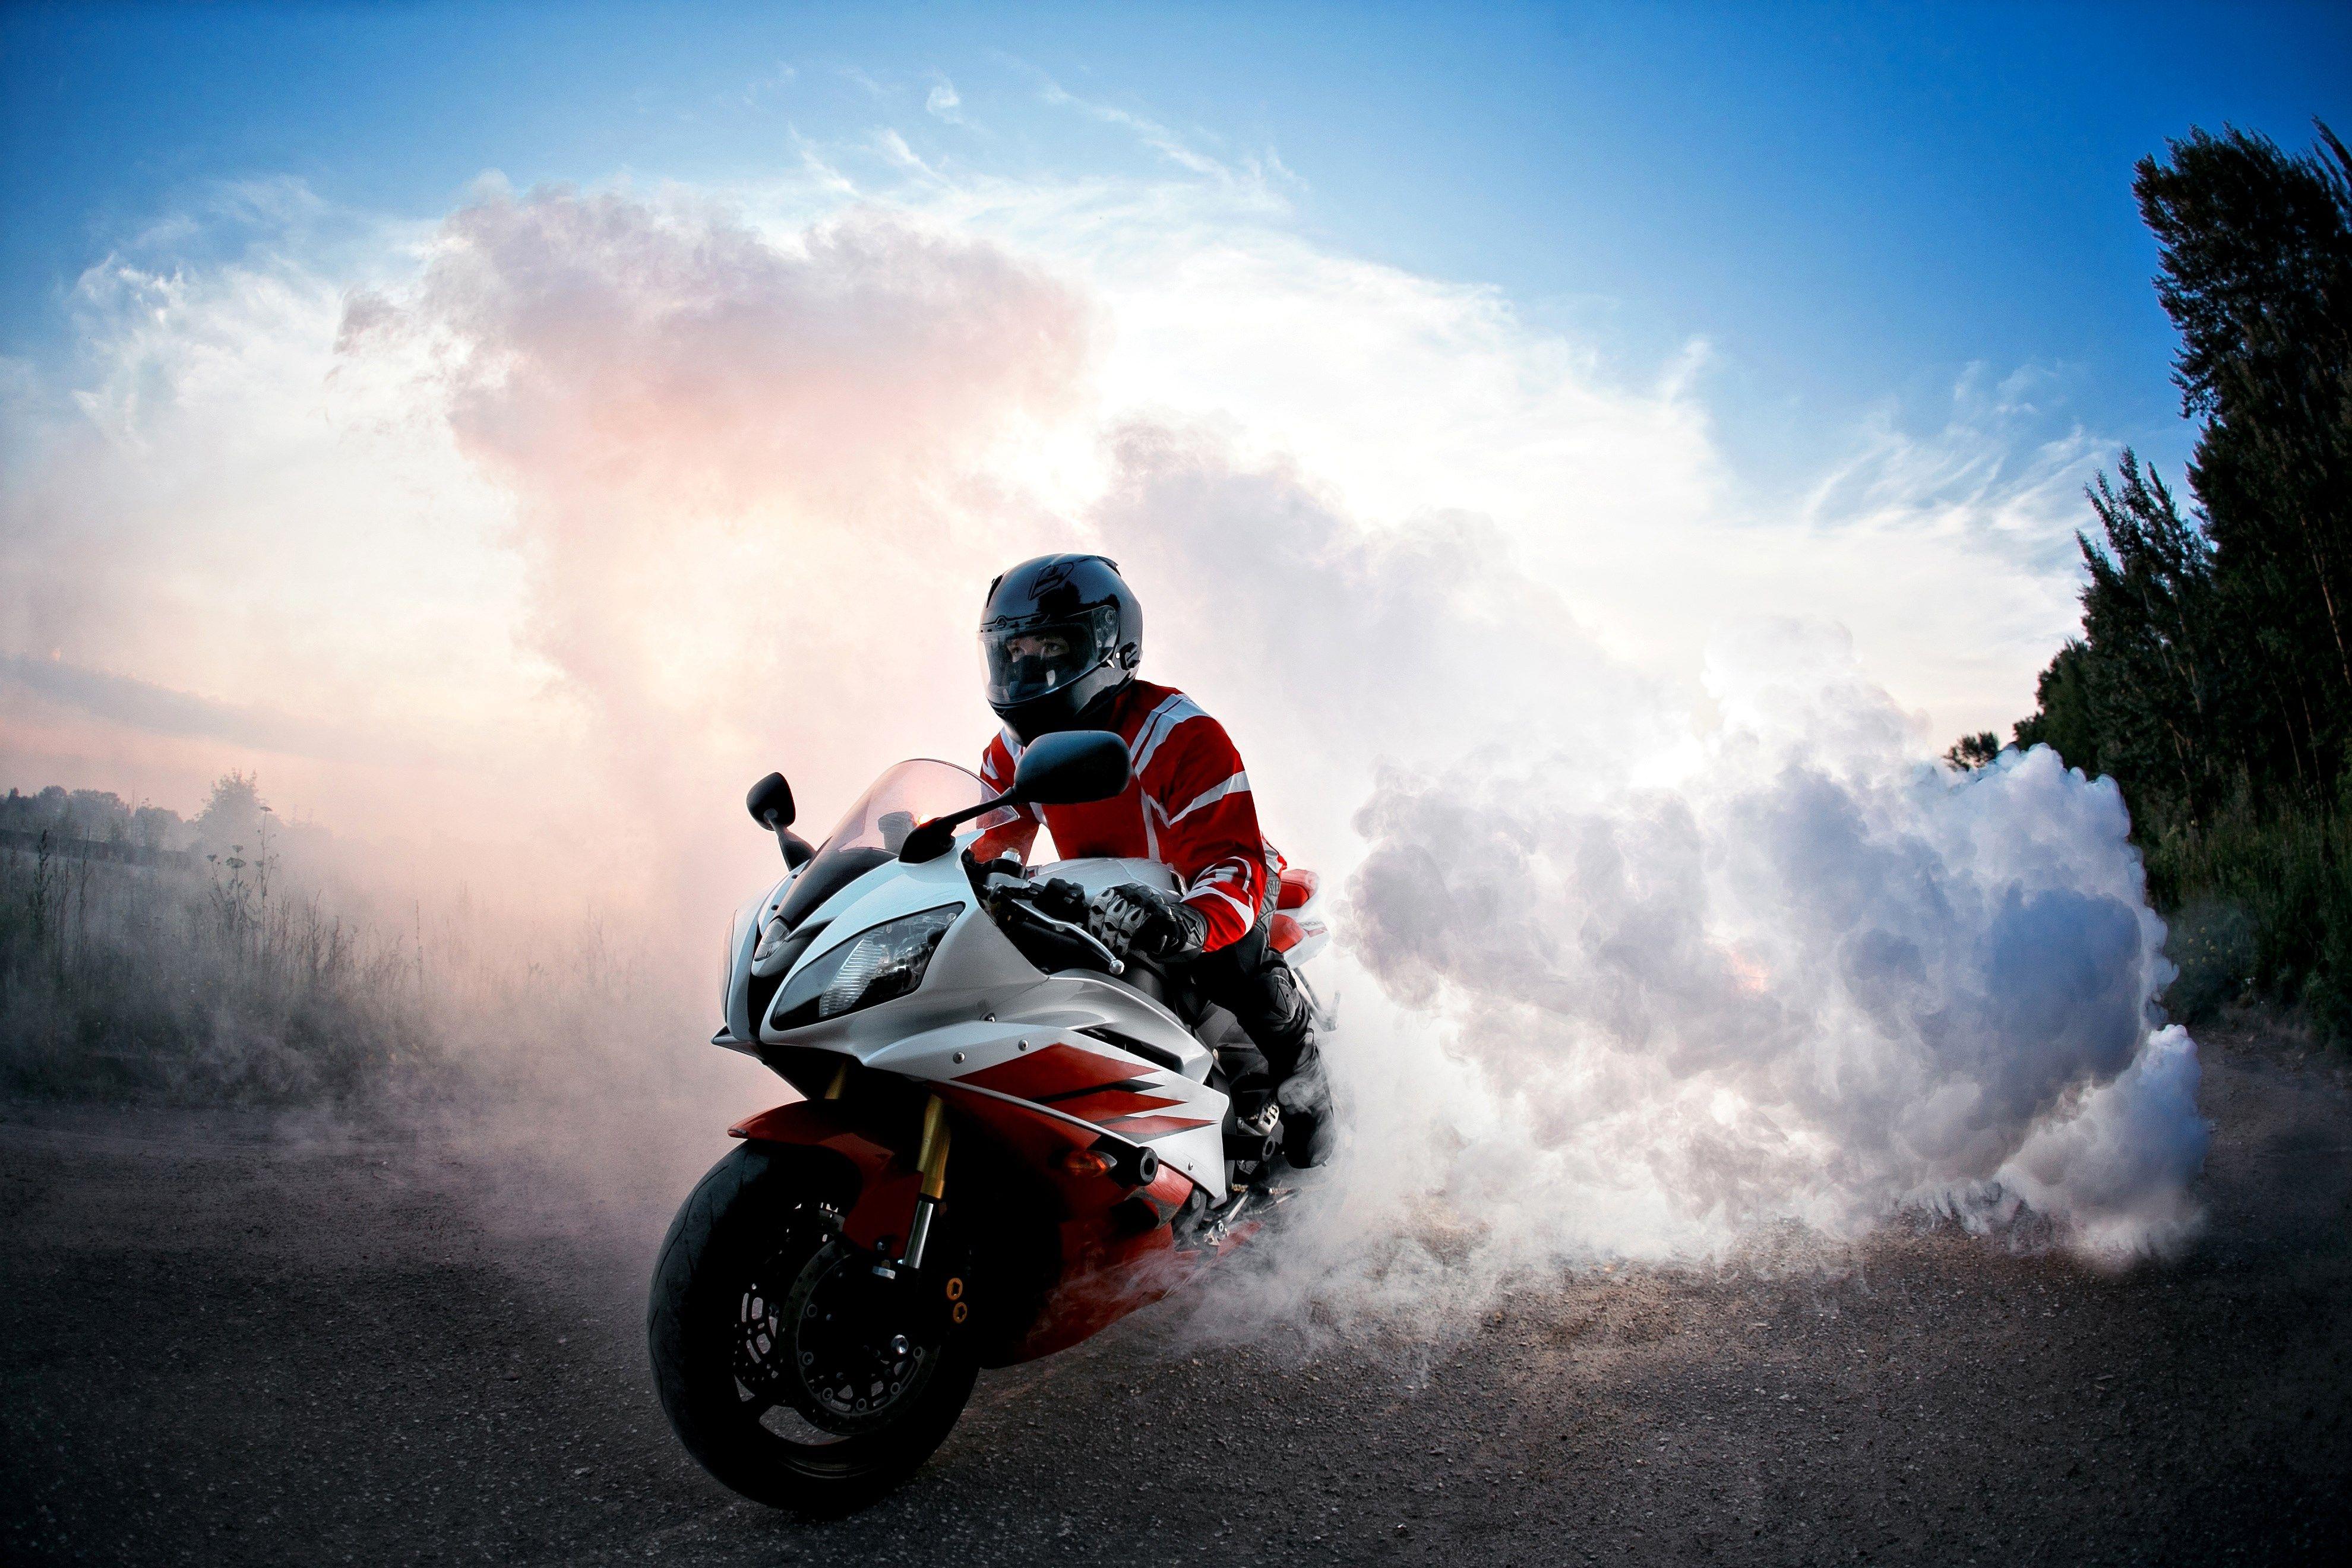 Обои motorcycle. Мотоциклы foto 10